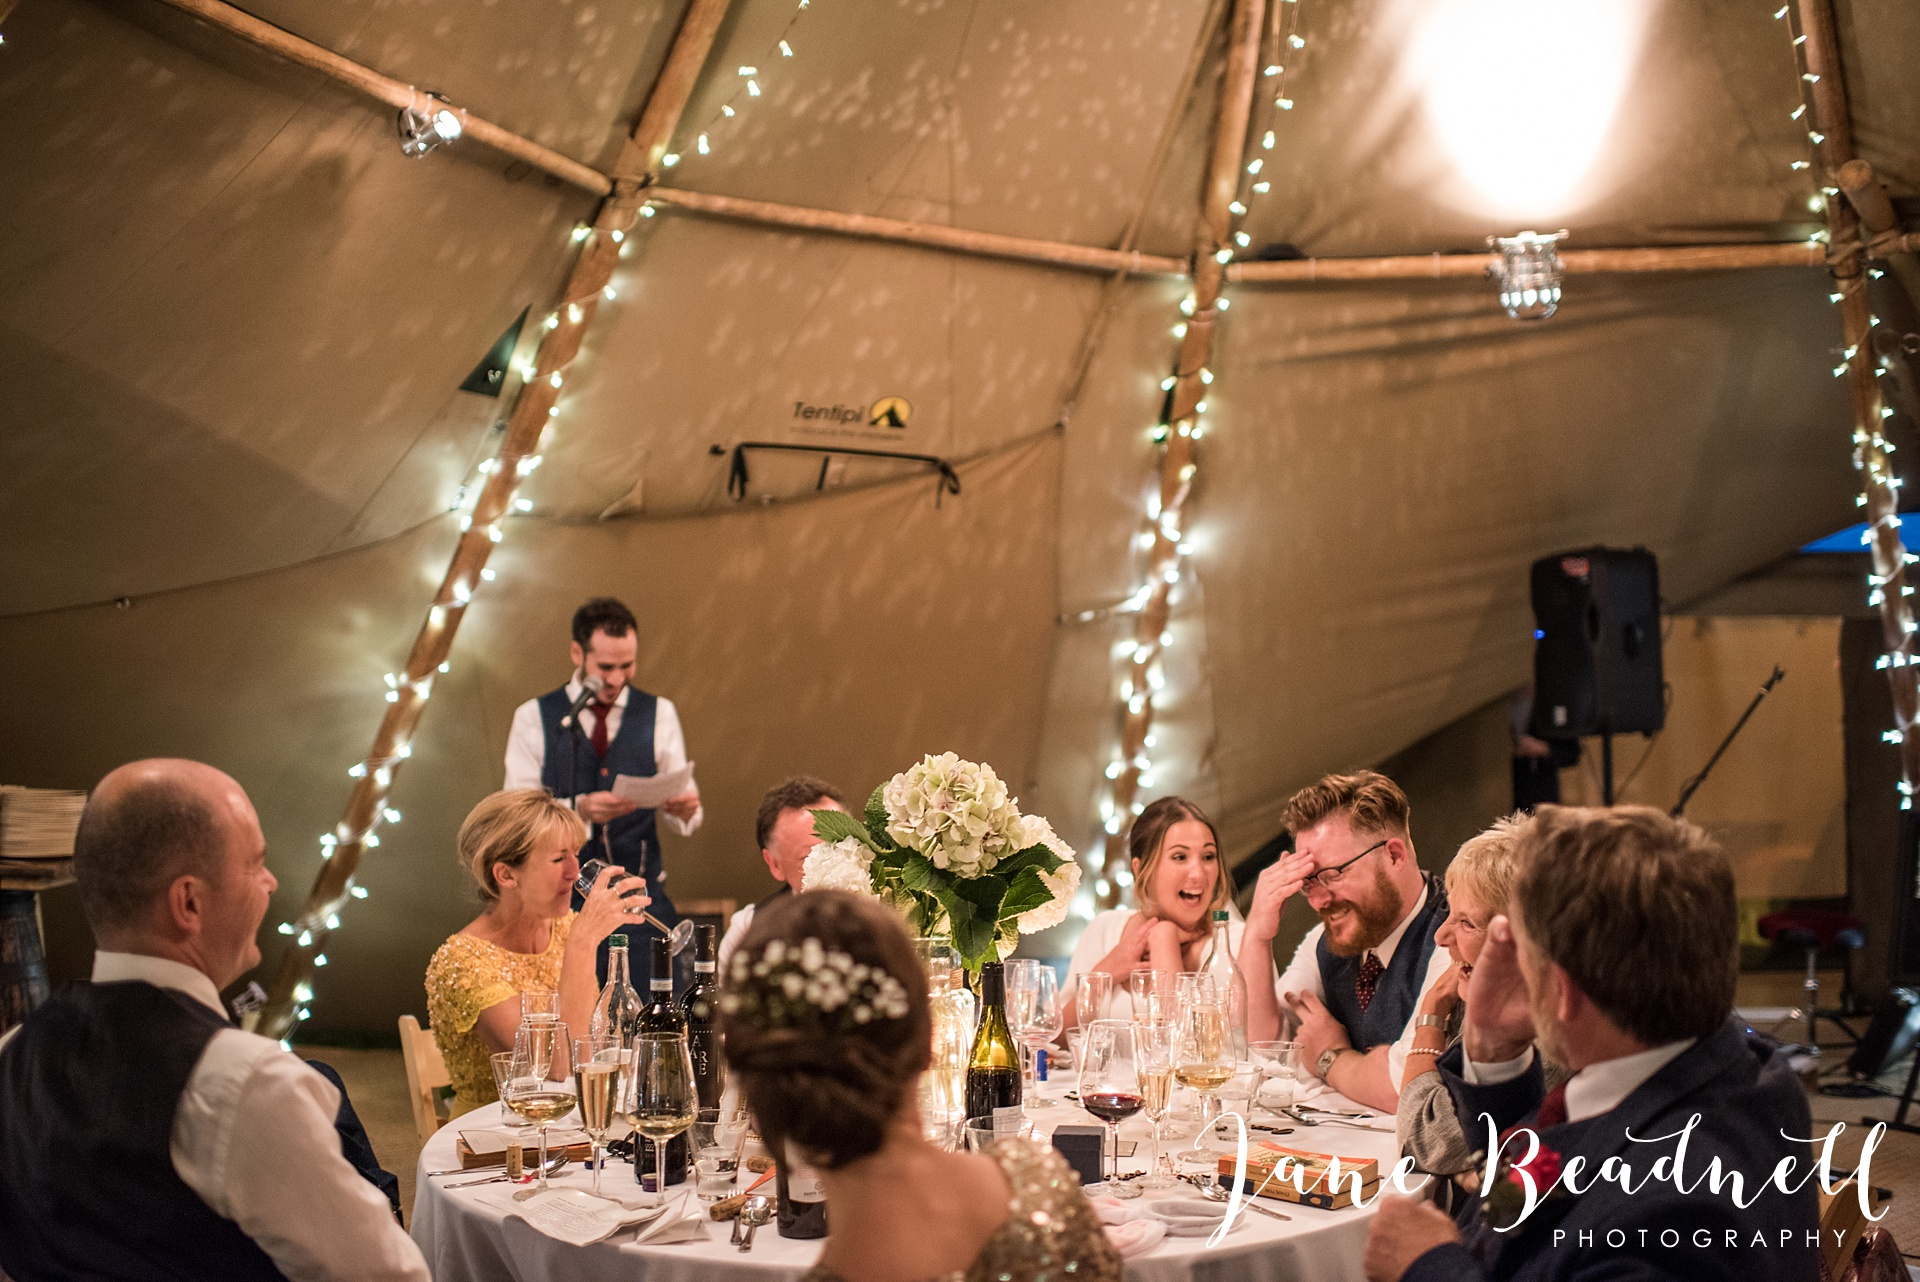 fine-art-wedding-photographer-jane-beadnell-yorkshire-wedding-photographer_0144